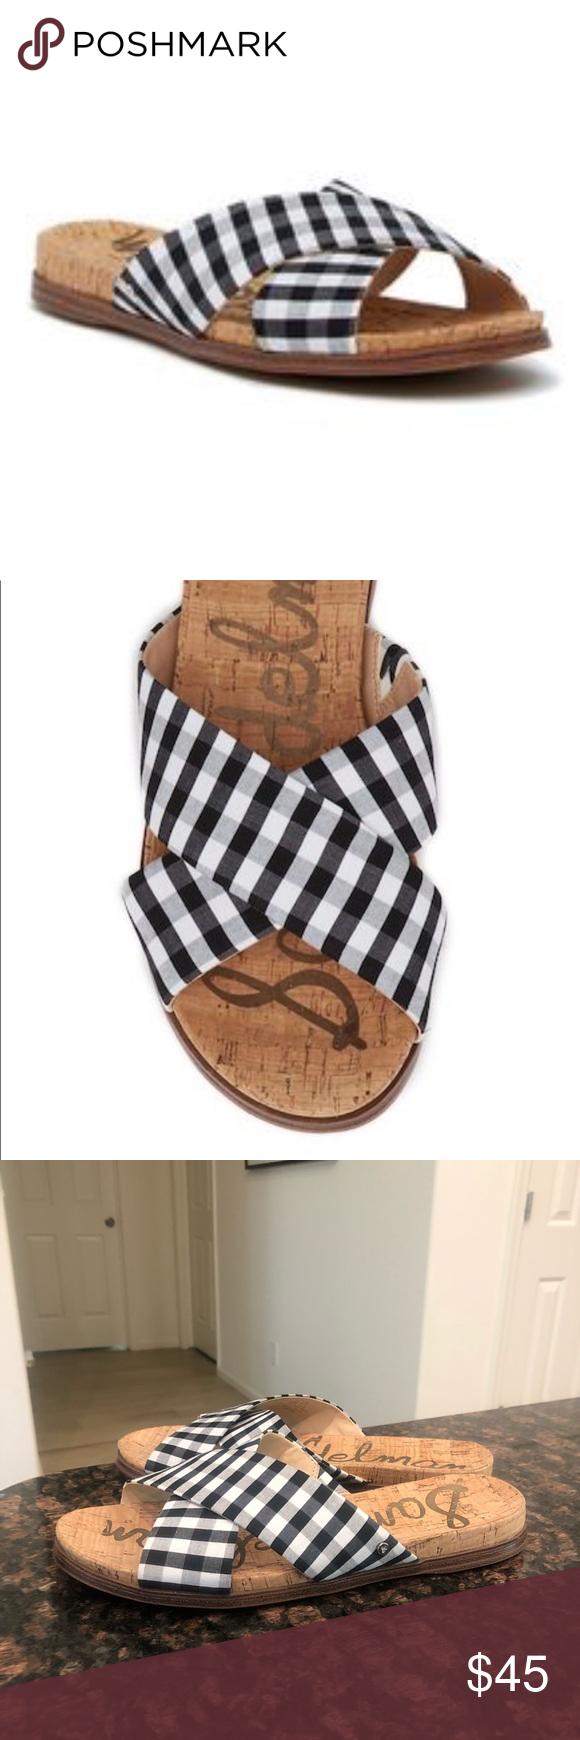 cc2fb0c00802 NEW Sam Edelman Hattie Criss-Cross Slide Sandals NEW Sam Edelman Hattie  Criss-Cross Slide Sandals. Size 7.5. Sam Edelman Shoes Sandals